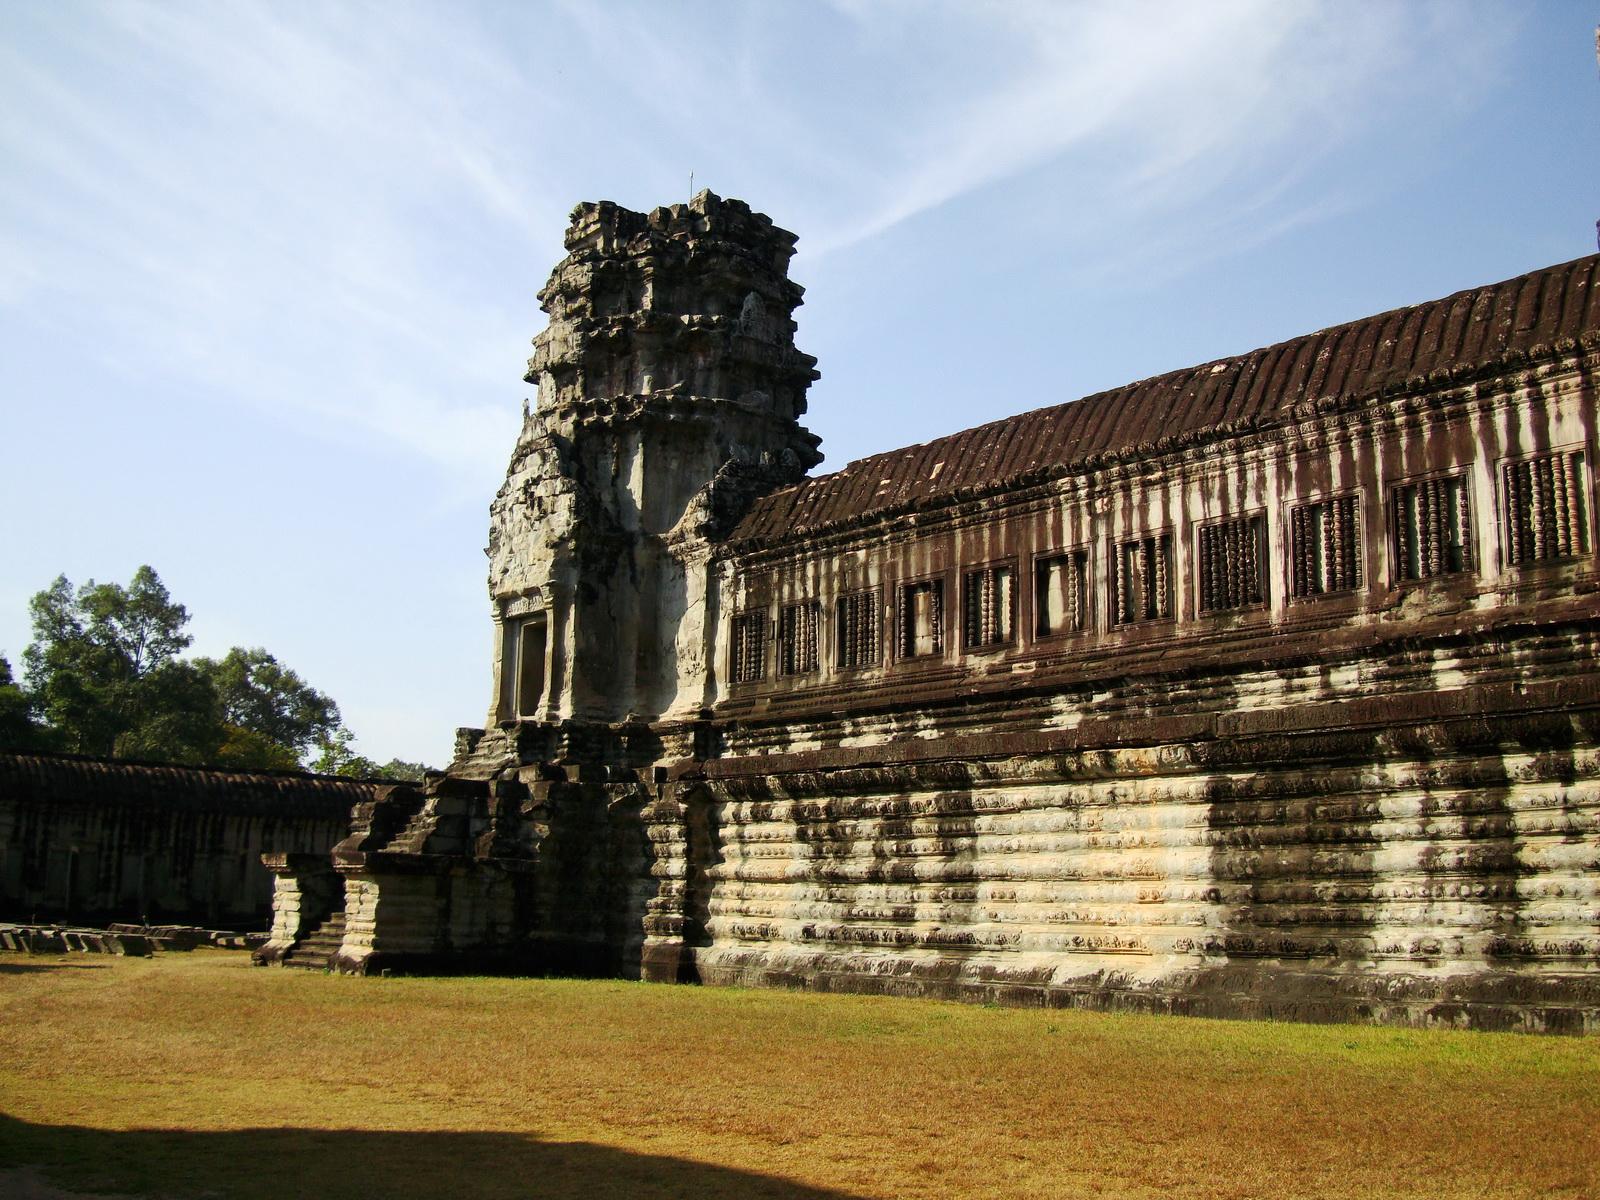 Angkor Wat Khmer architecture internal gallery E entrance 08